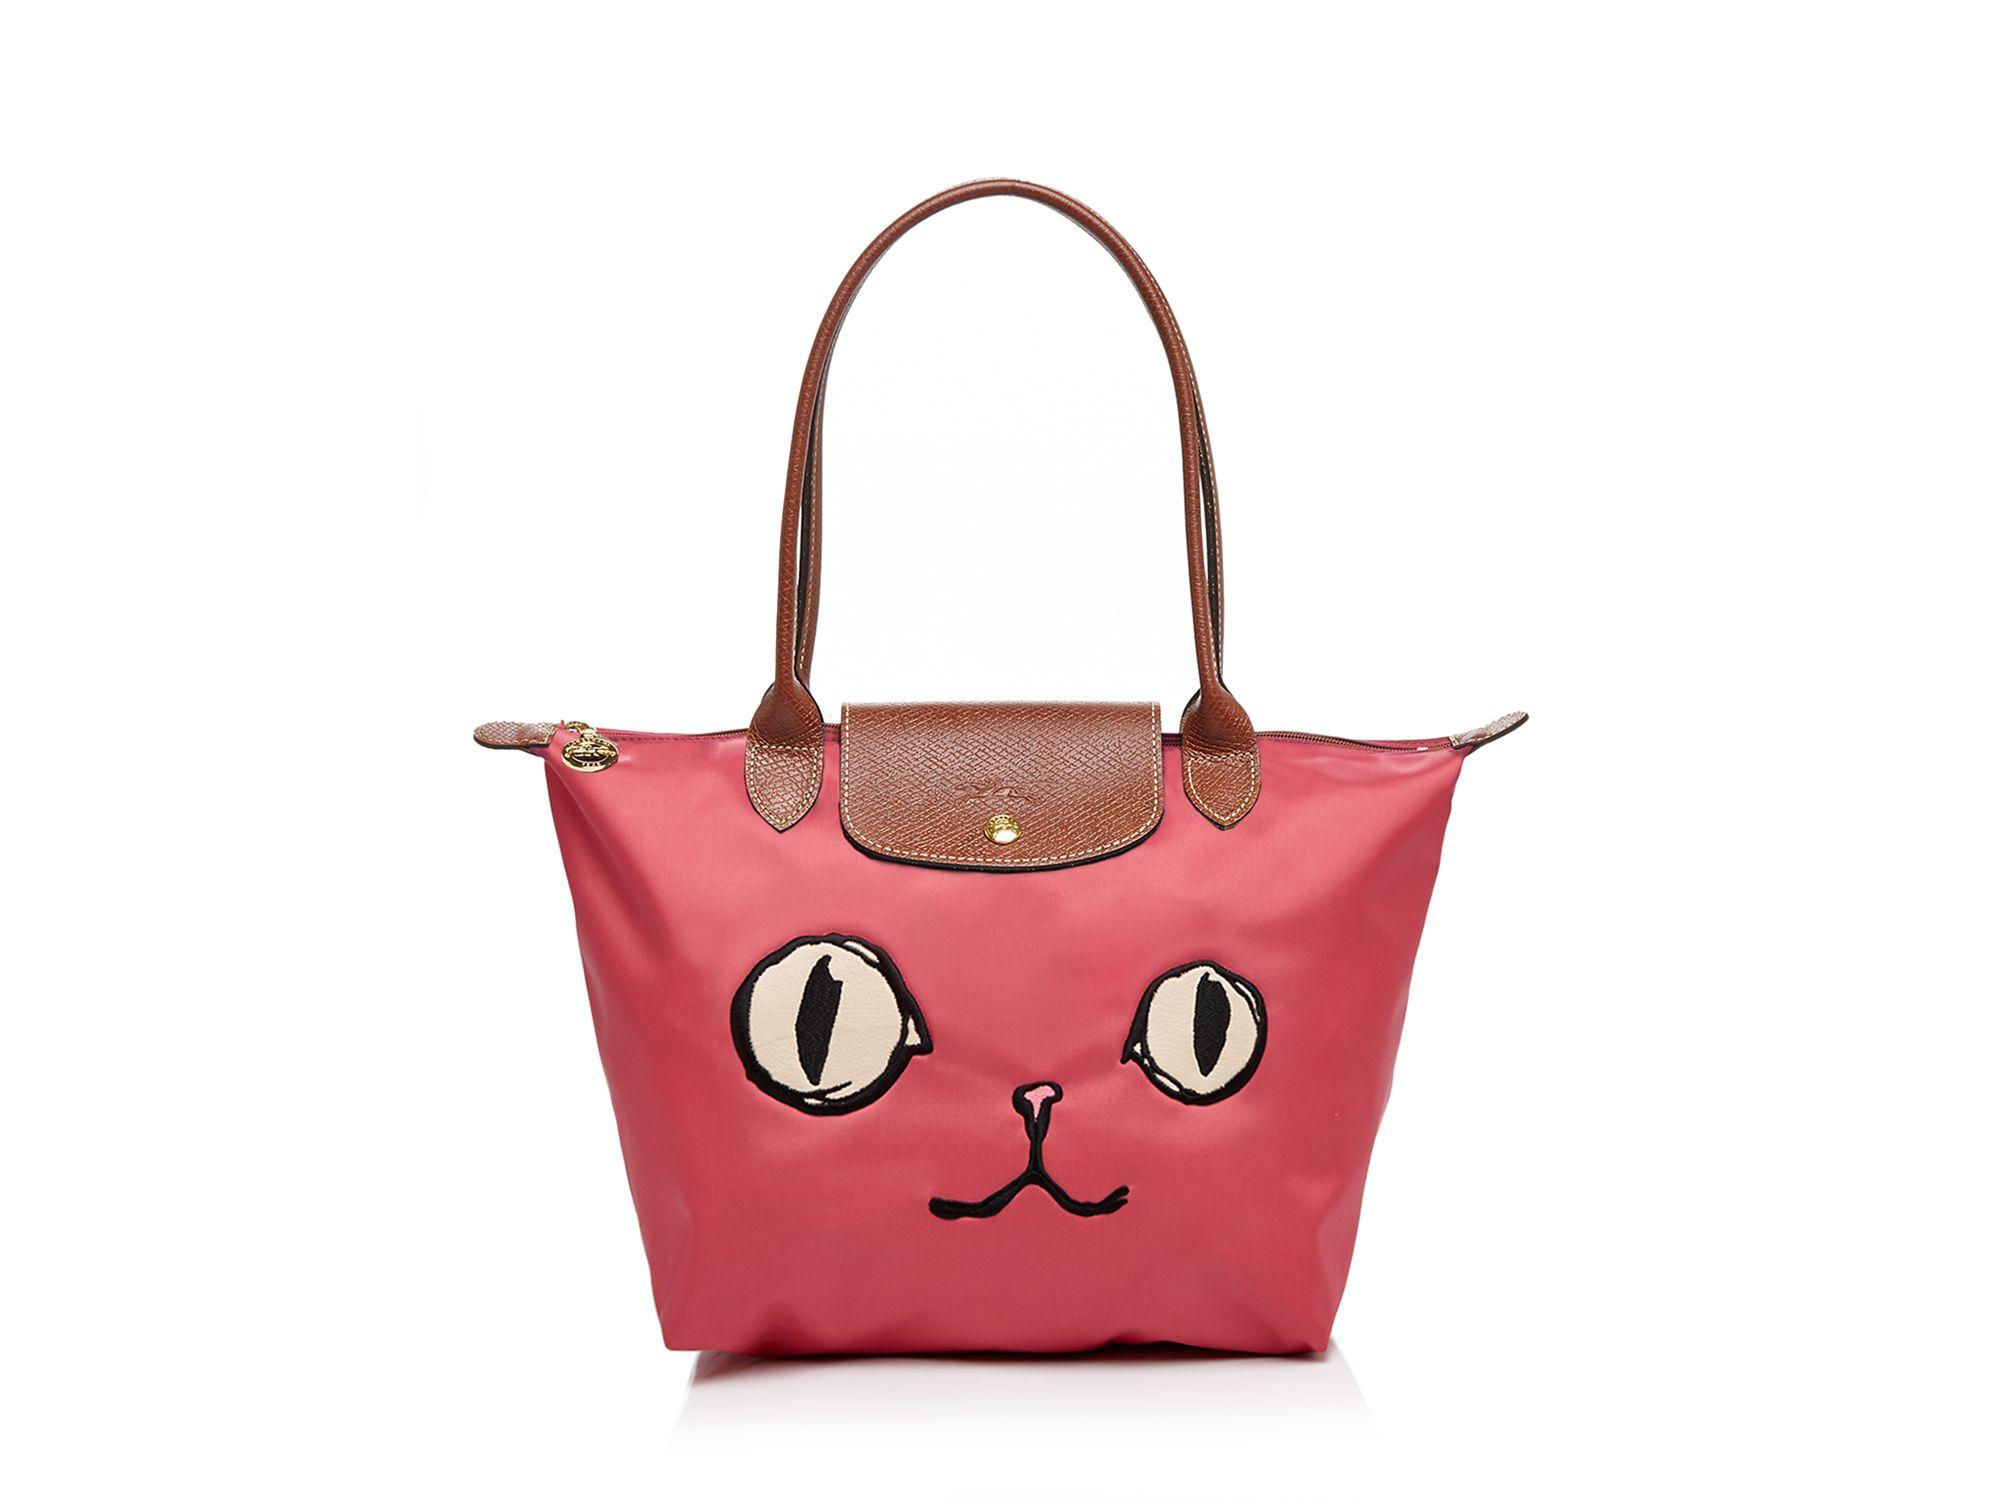 Lyst - Longchamp Le Pliage Miaou Medium Shoulder Bag in Pink